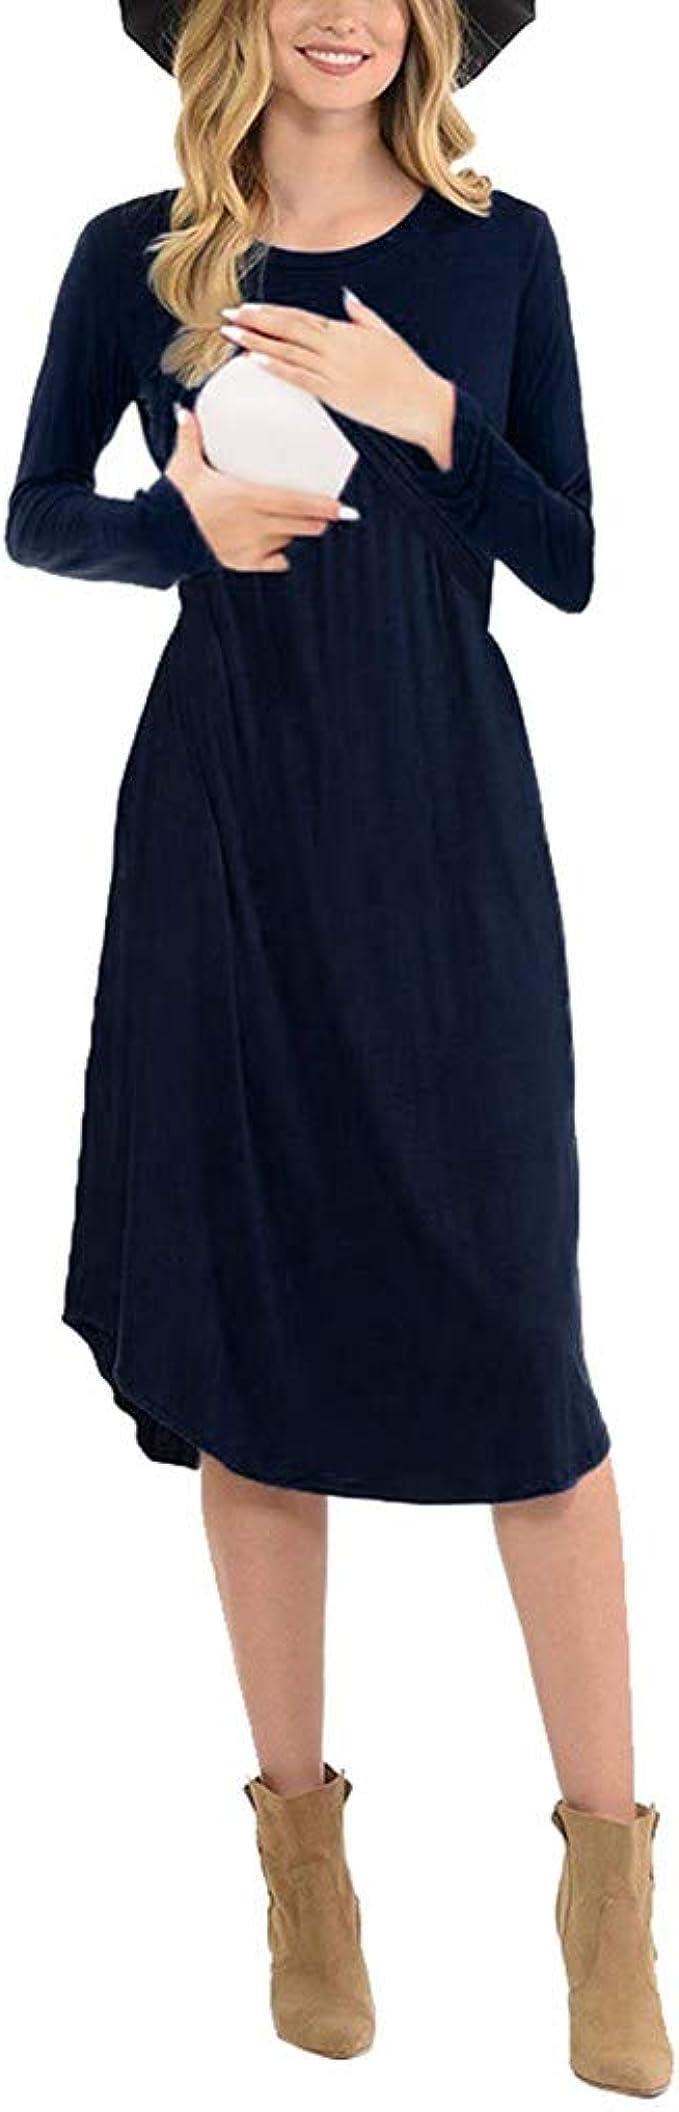 Schwanger Damen Umstandsmode Umstandskleid Schwangerschaftskleid Stillkleid